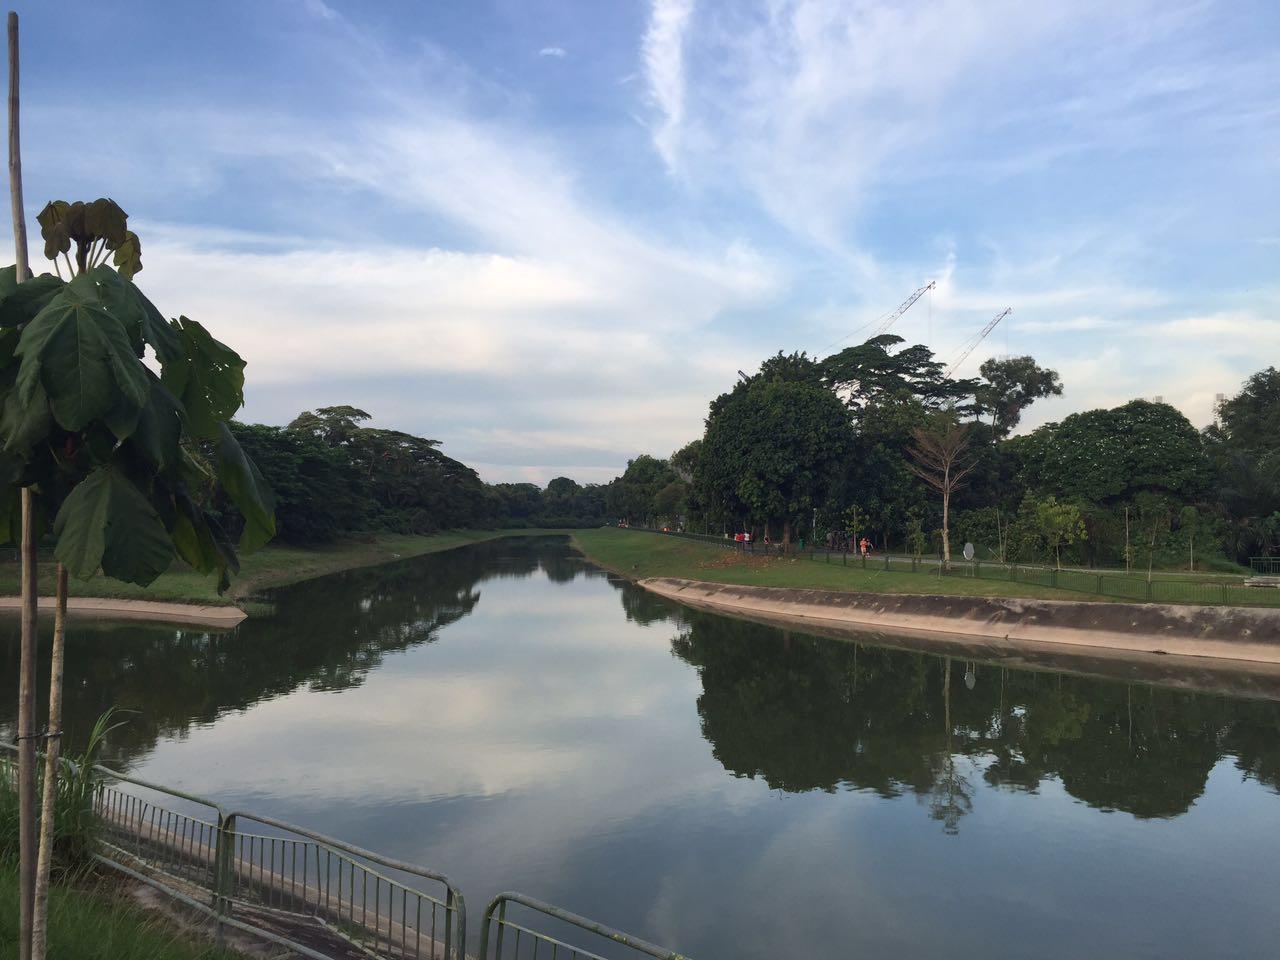 ParcRiviera_Pandan Reservoir1.jpeg